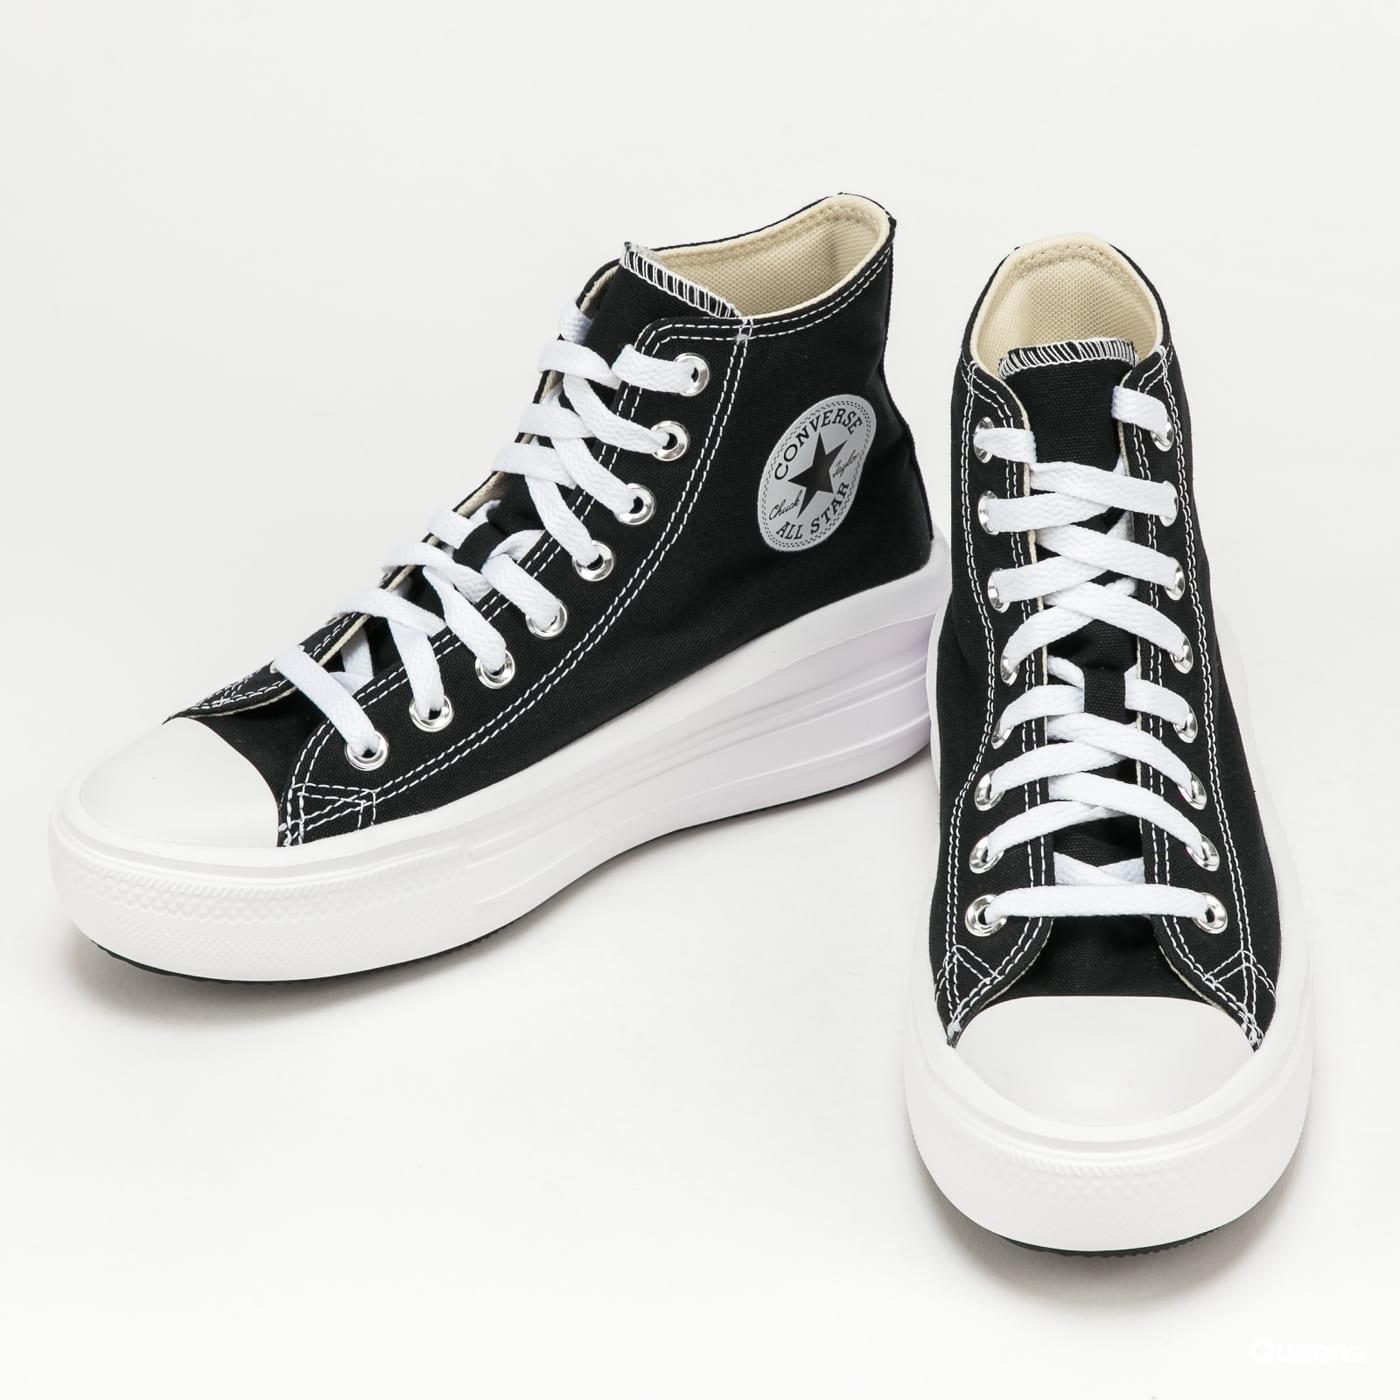 Converse Chuck Taylor All Star MOve Hi black / natural ivory / white